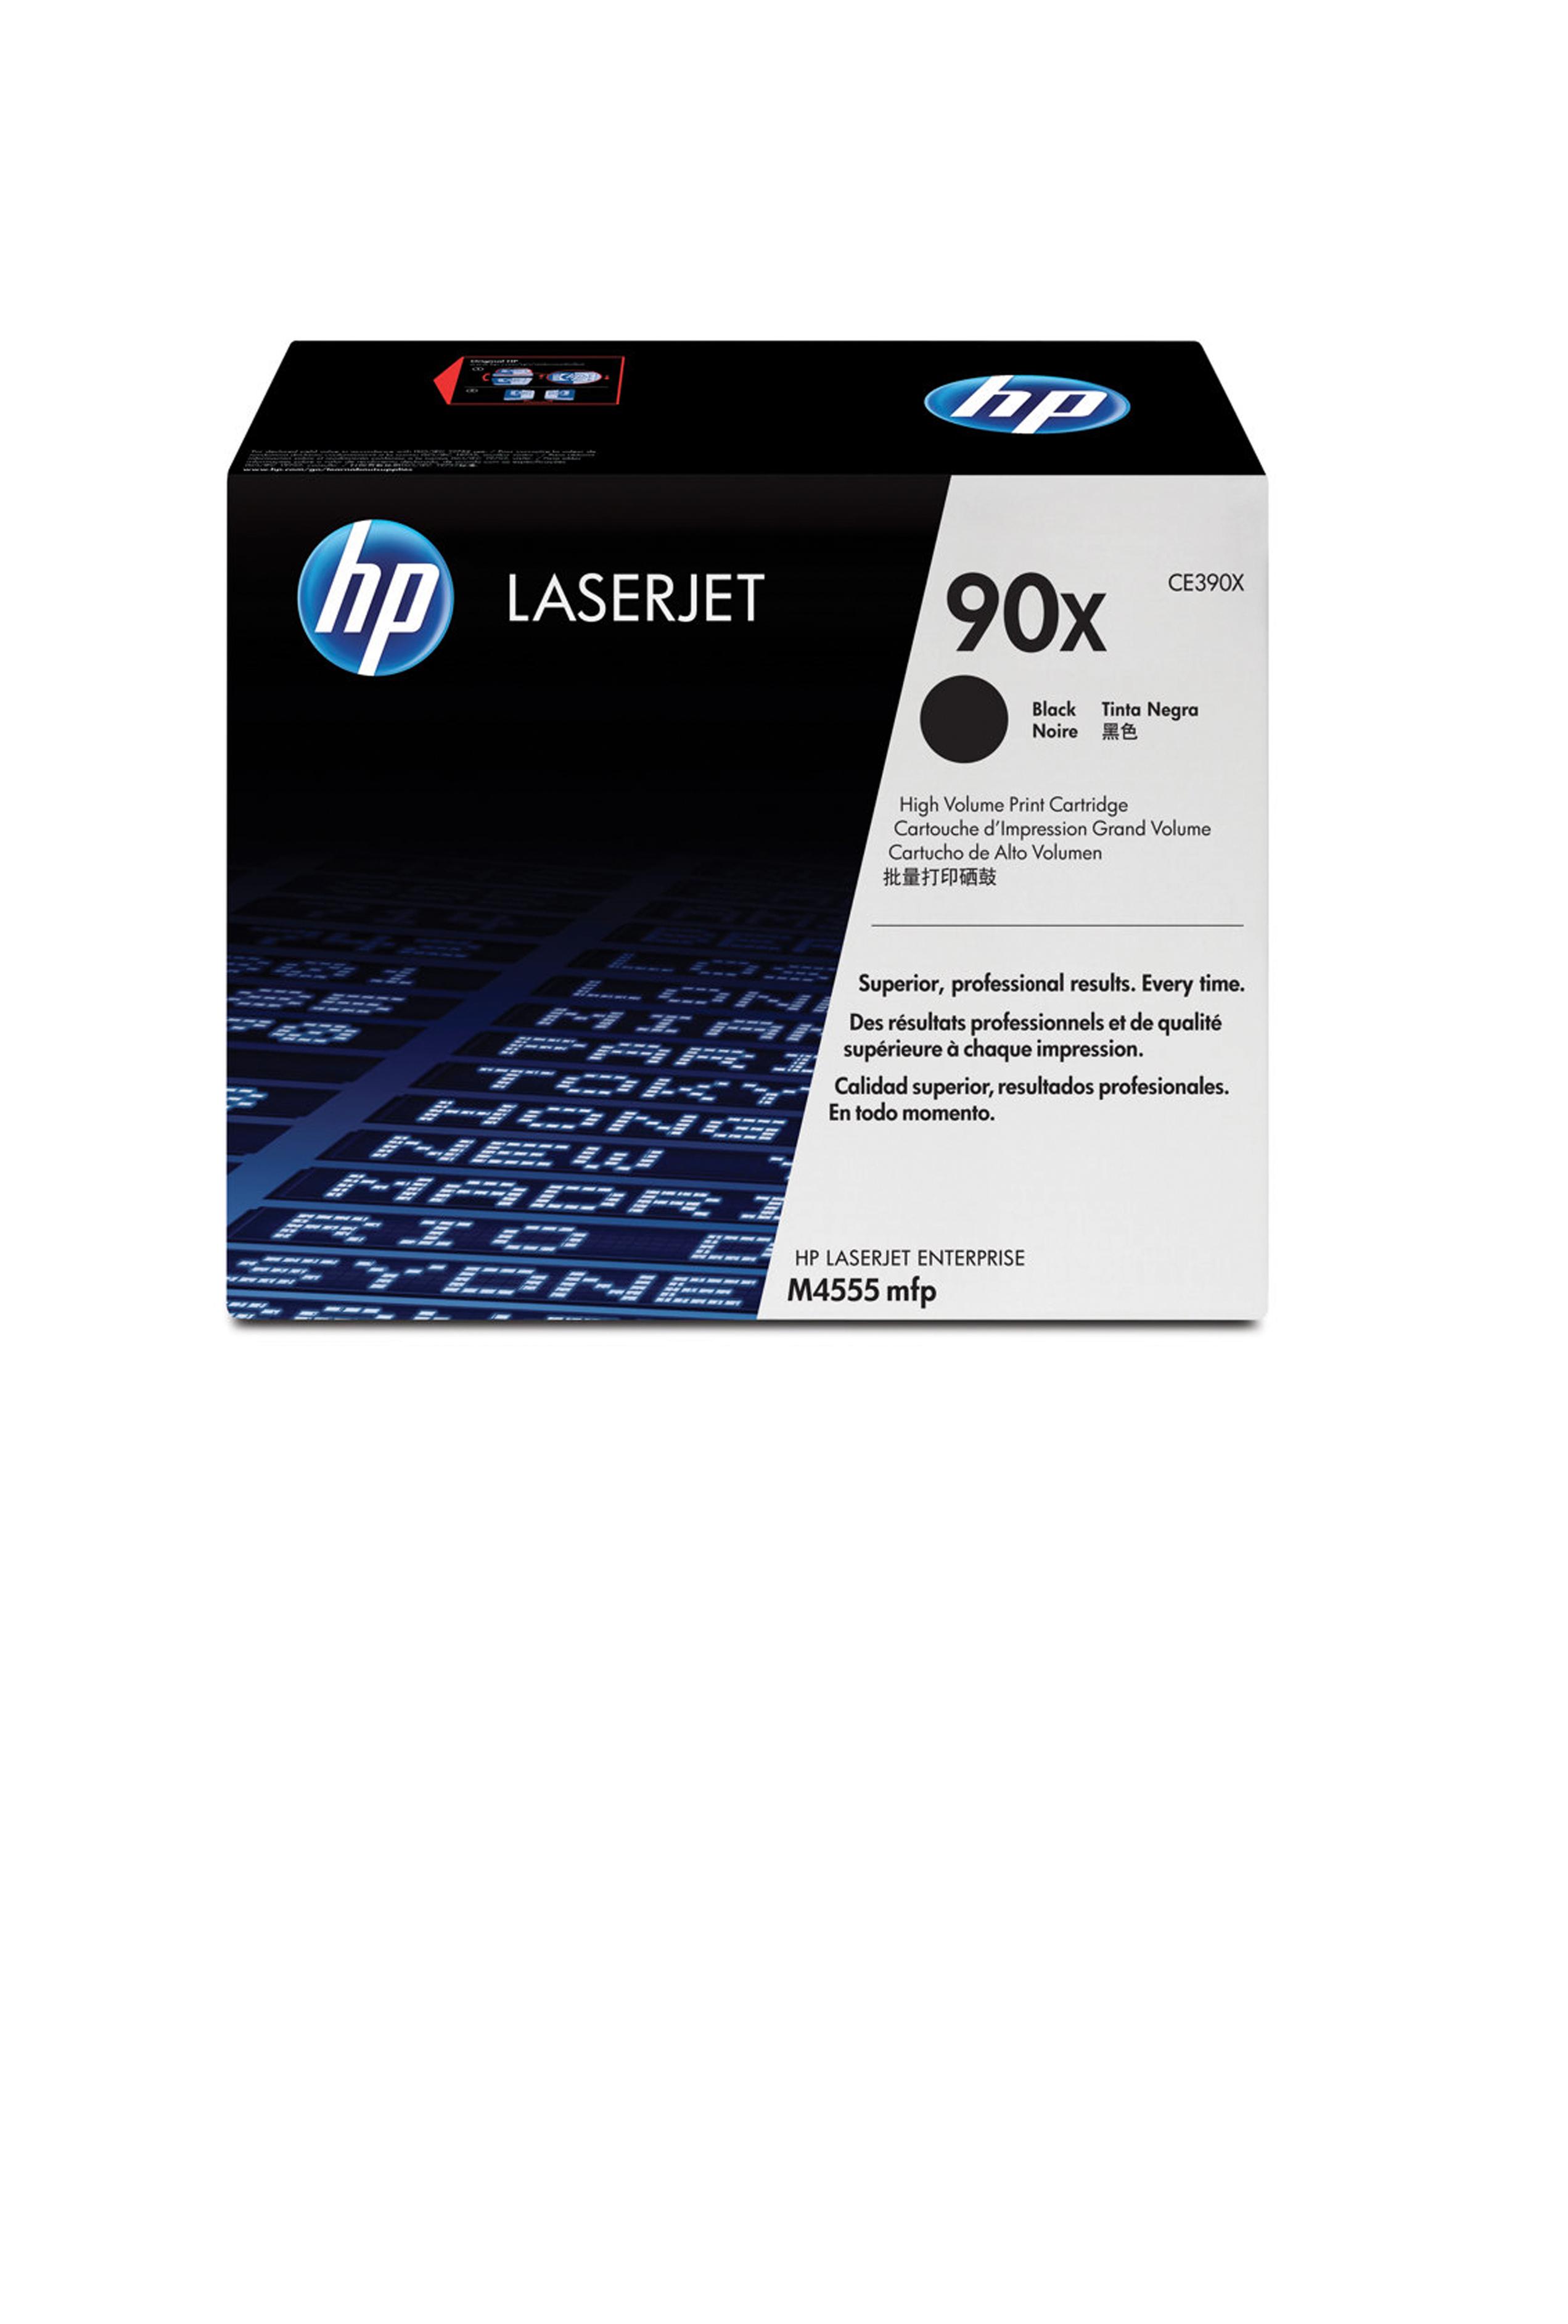 HP Laserjet High Volume Cartrdige (CE390XC)